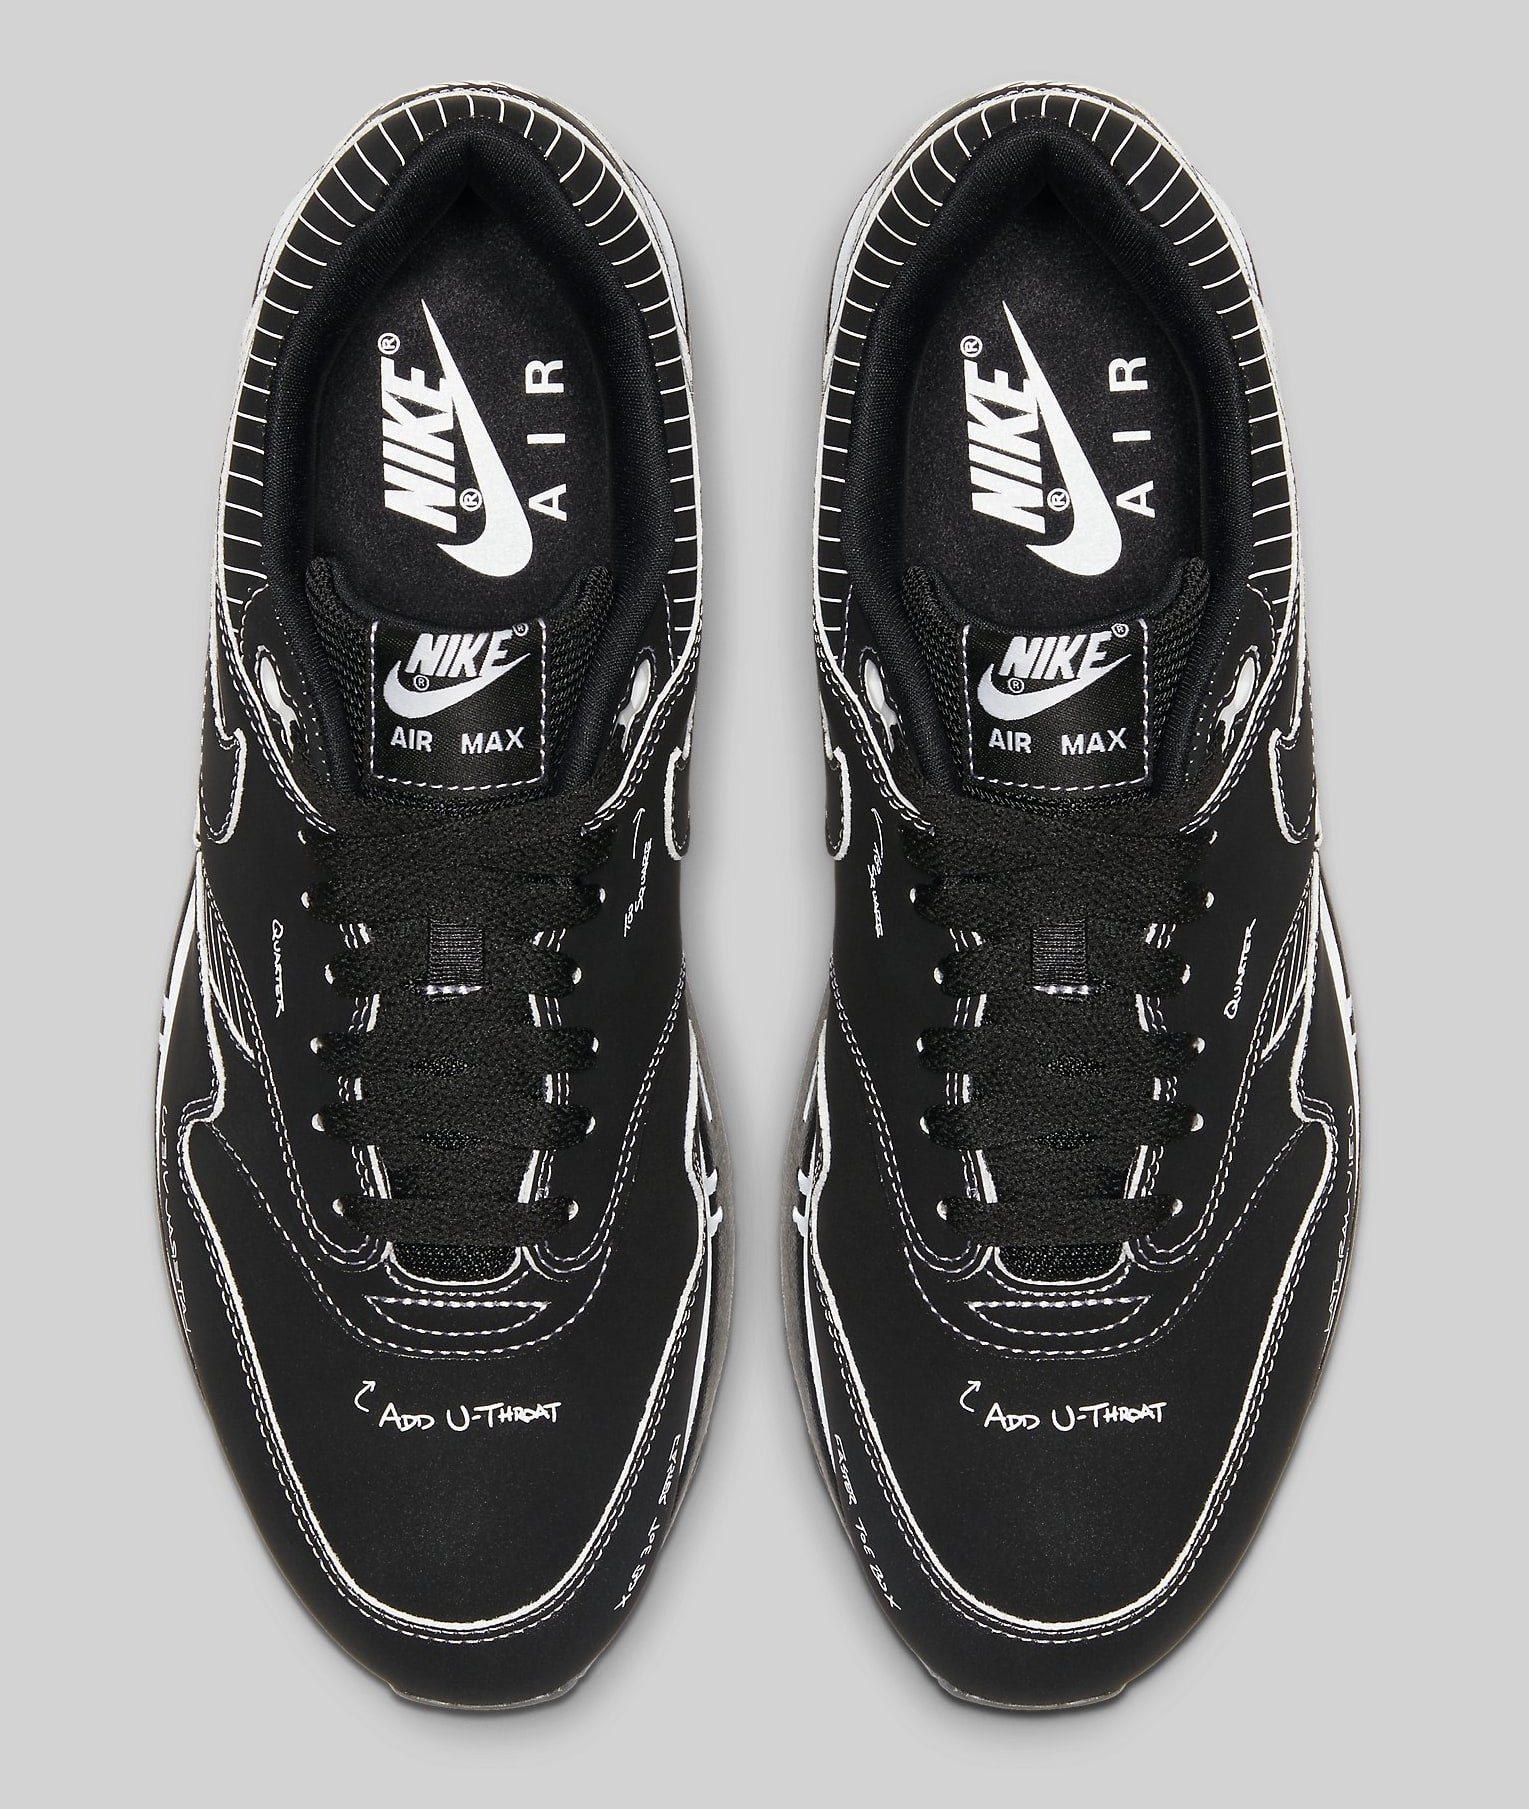 Nike Air Max 1 Black 'Schematic' CJ4286-001 Top